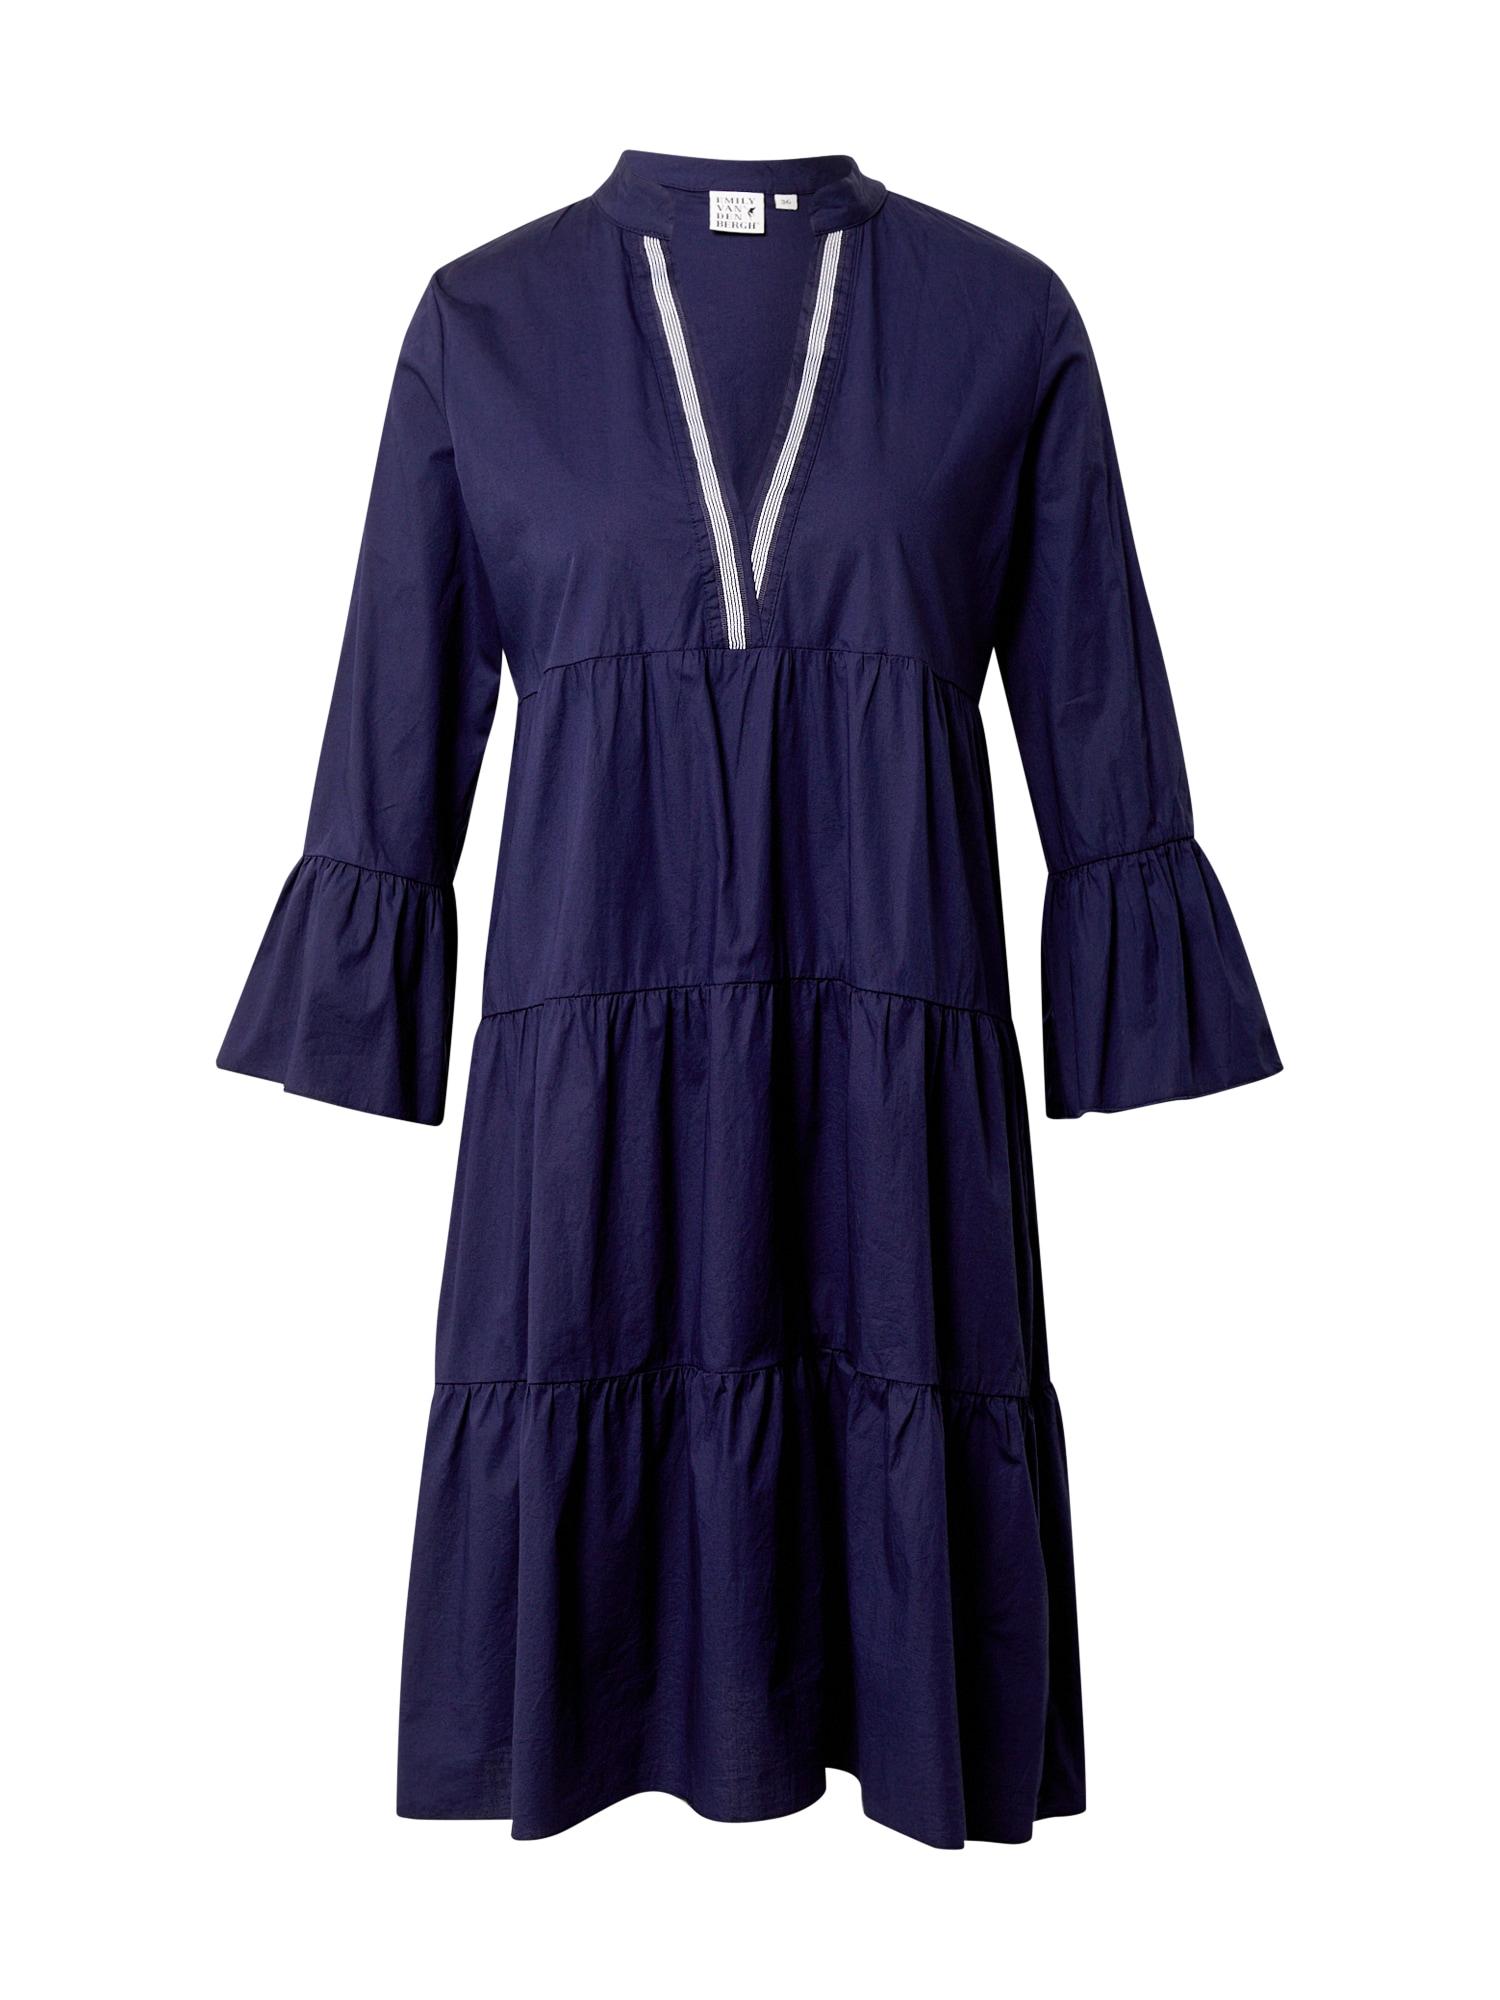 Emily Van Den Bergh Suknelė tamsiai mėlyna / balta